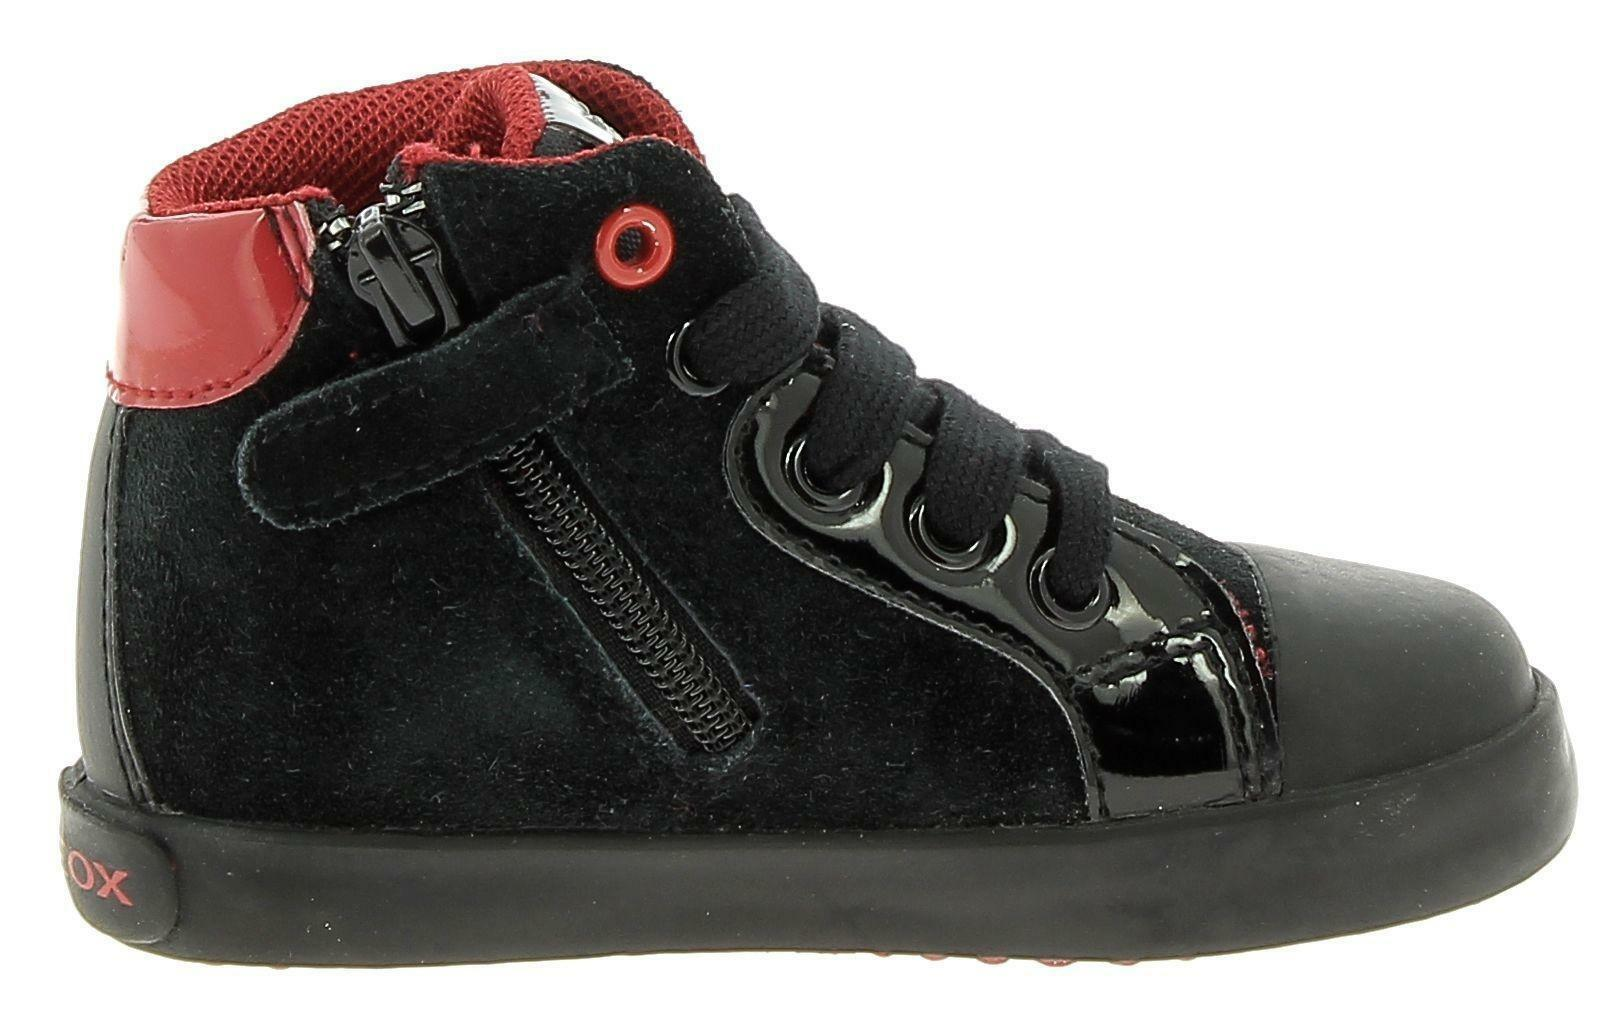 geox geox b kiwi g scarpe sportive bambina nere